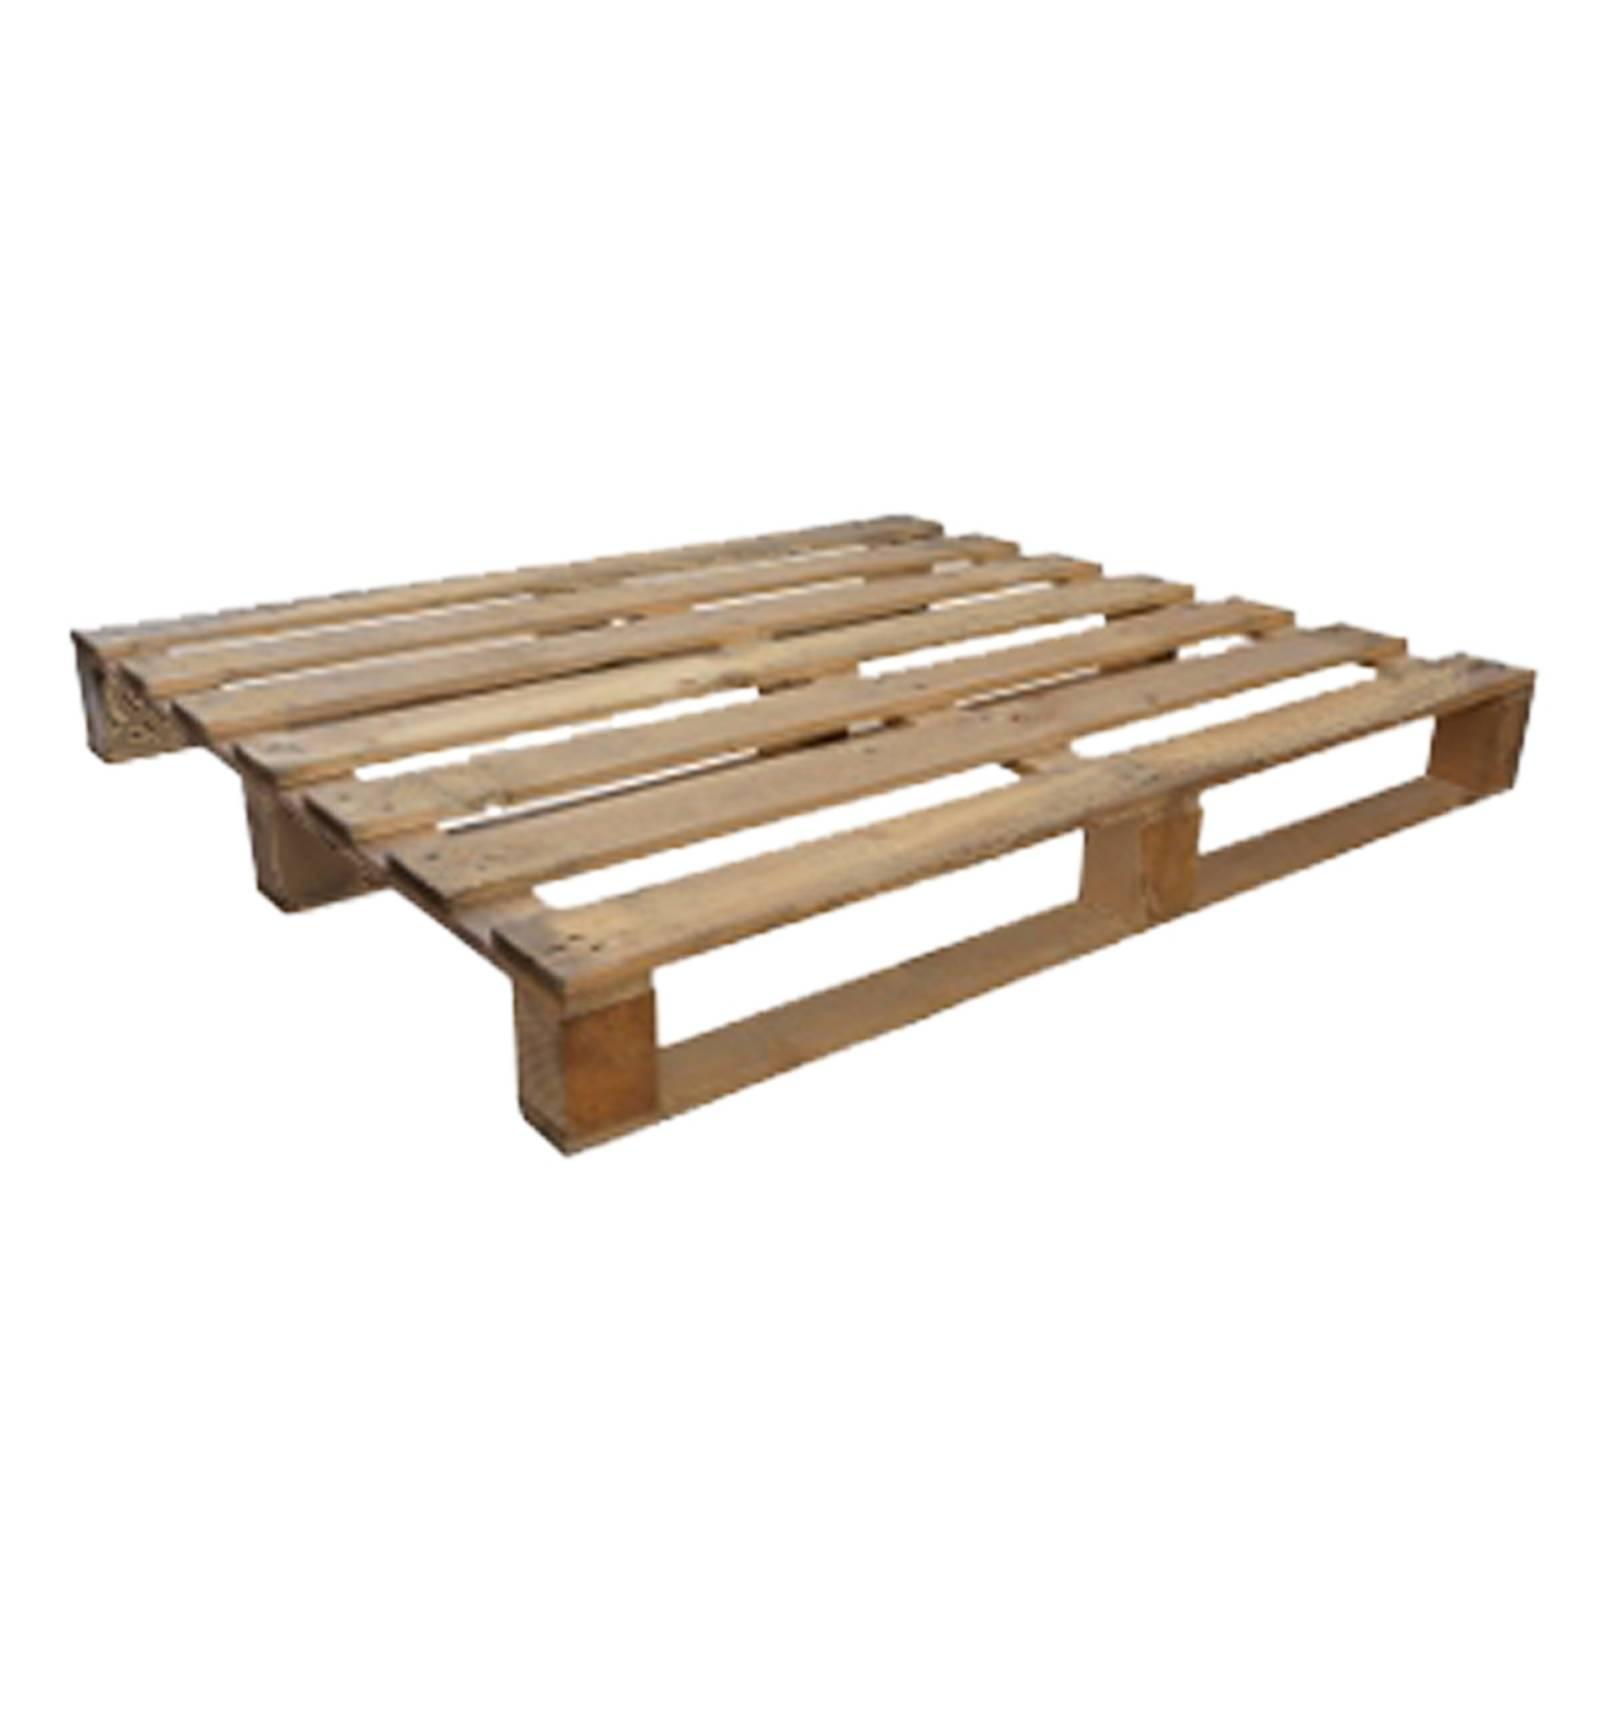 Wooden Pallet 1000 X 1200 X 120 - 3Bottom boards - Ultra-Light